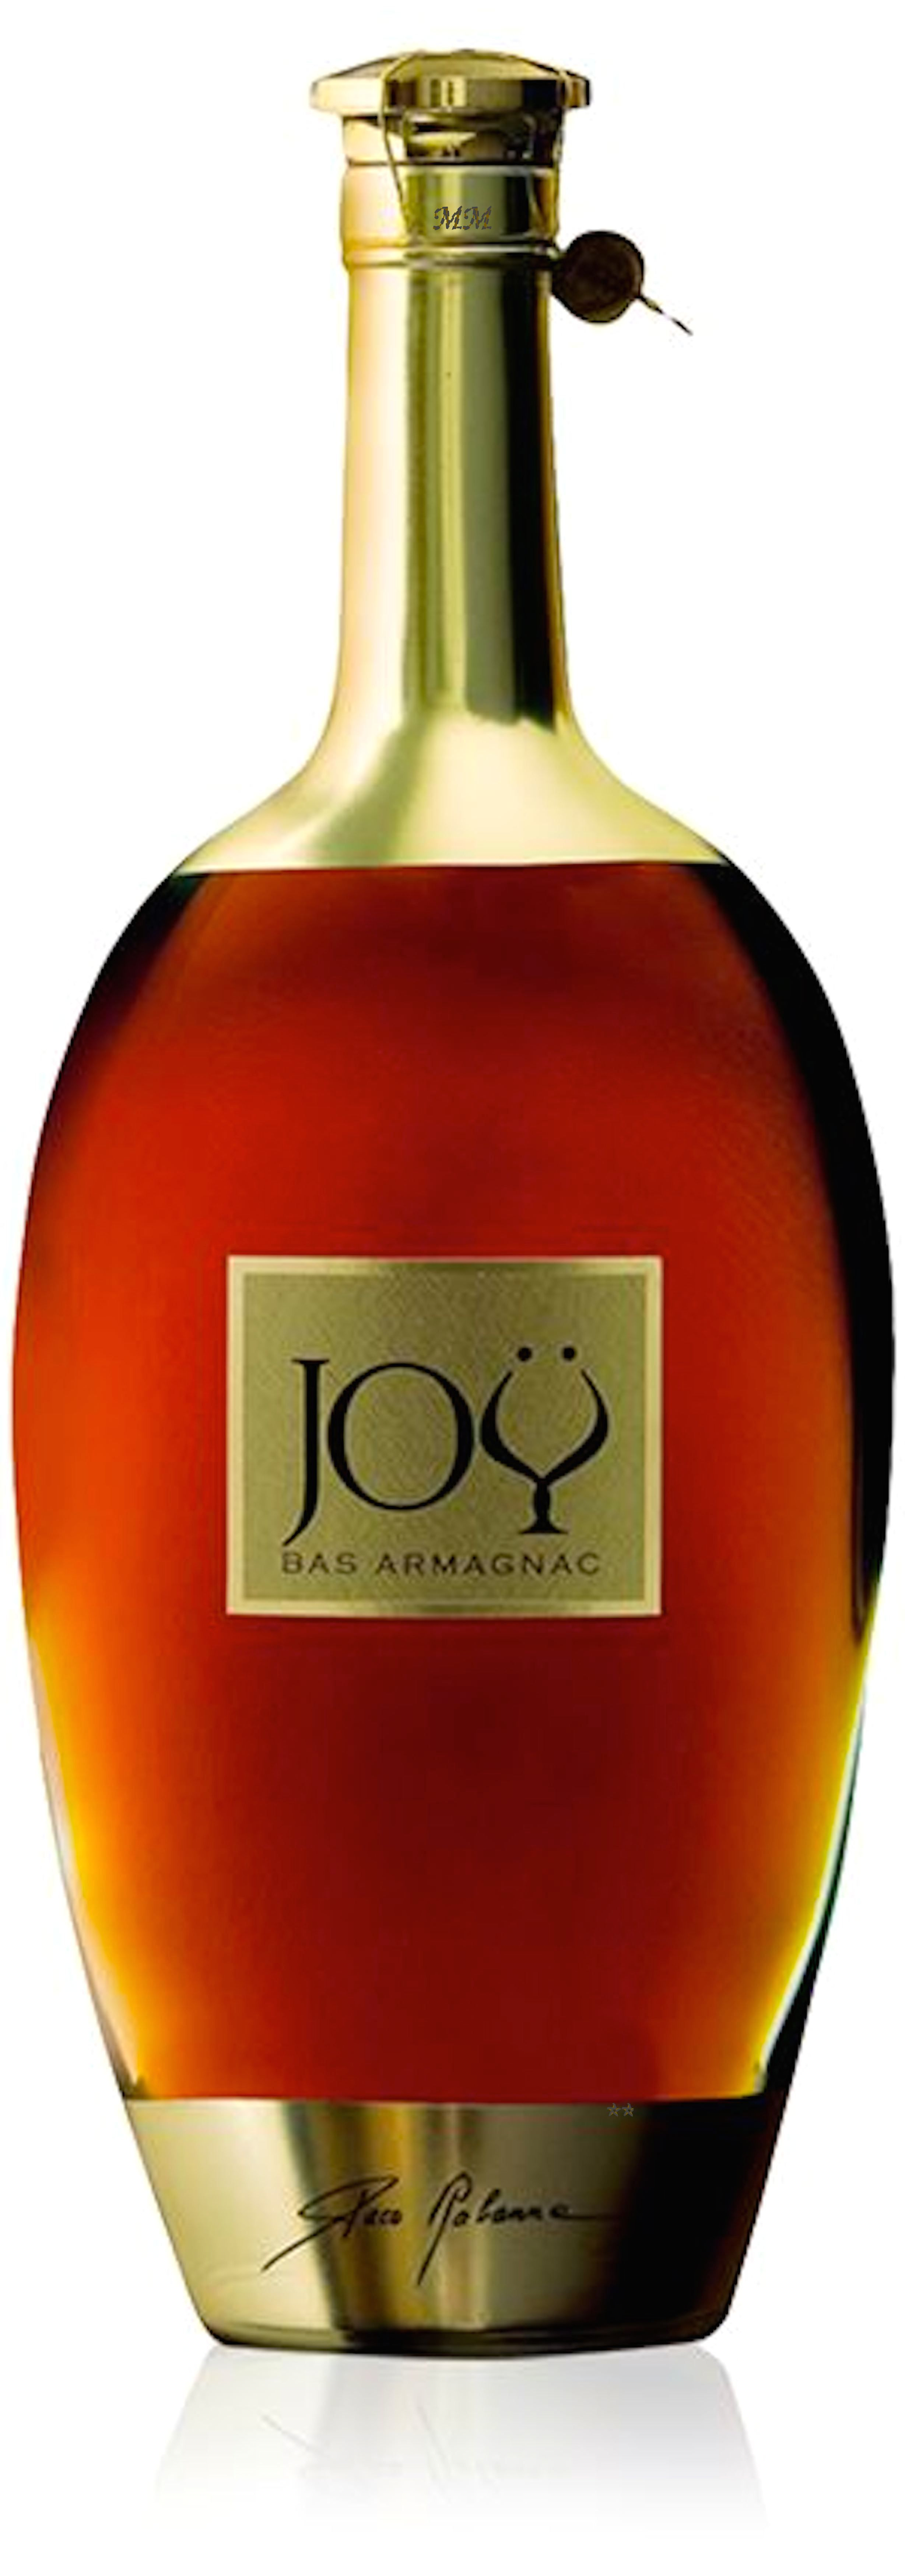 Domaine De Joy Armagnac 1893 Rose Wine Bottle Vodka Bottle Wine Bottle